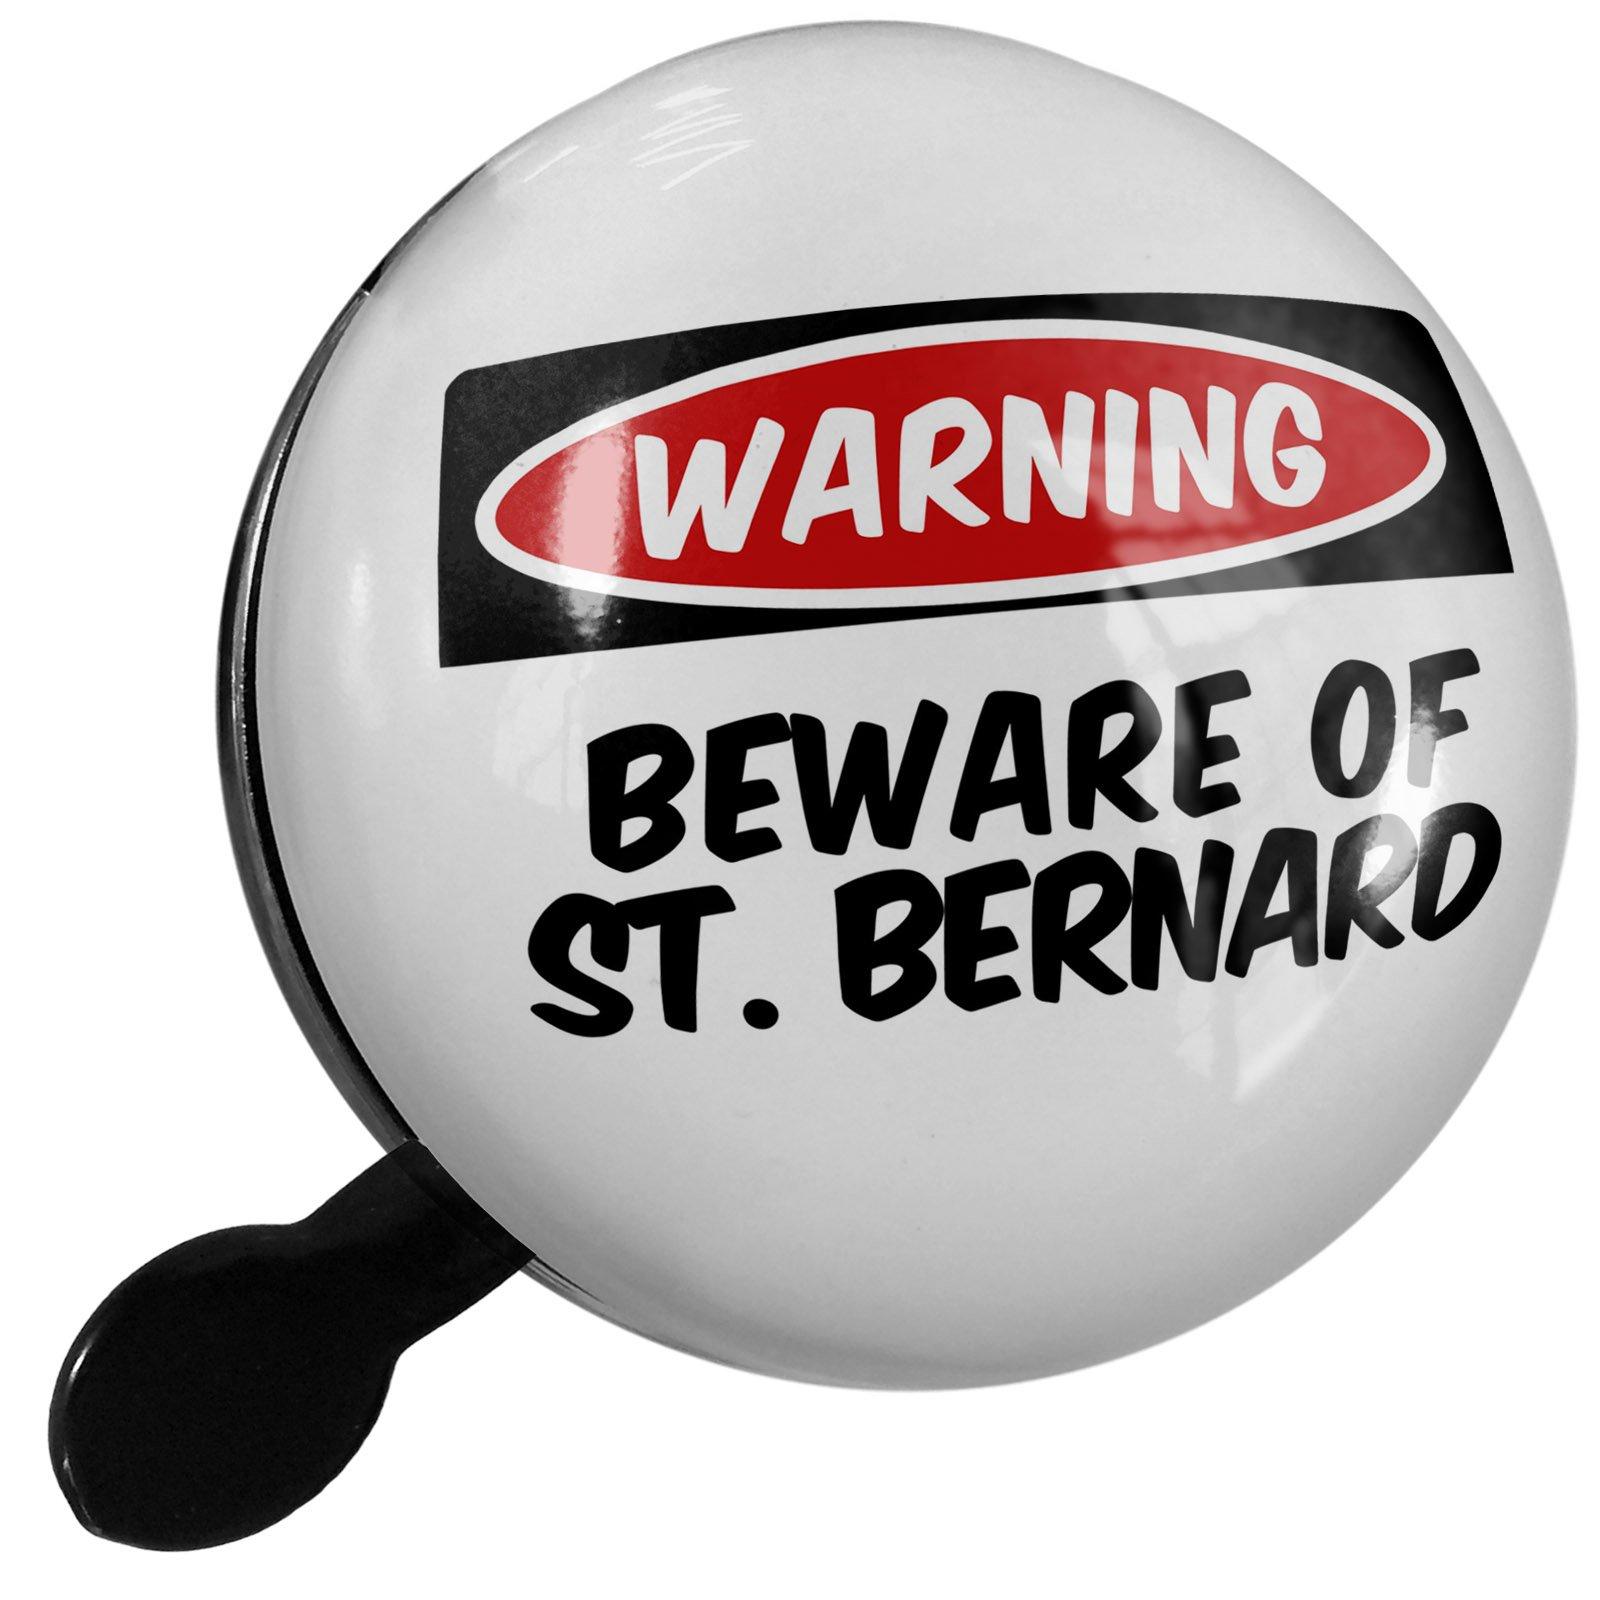 Small Bike Bell Beware of the St. Bernard Dog from Italy, Switzerland - NEONBLOND